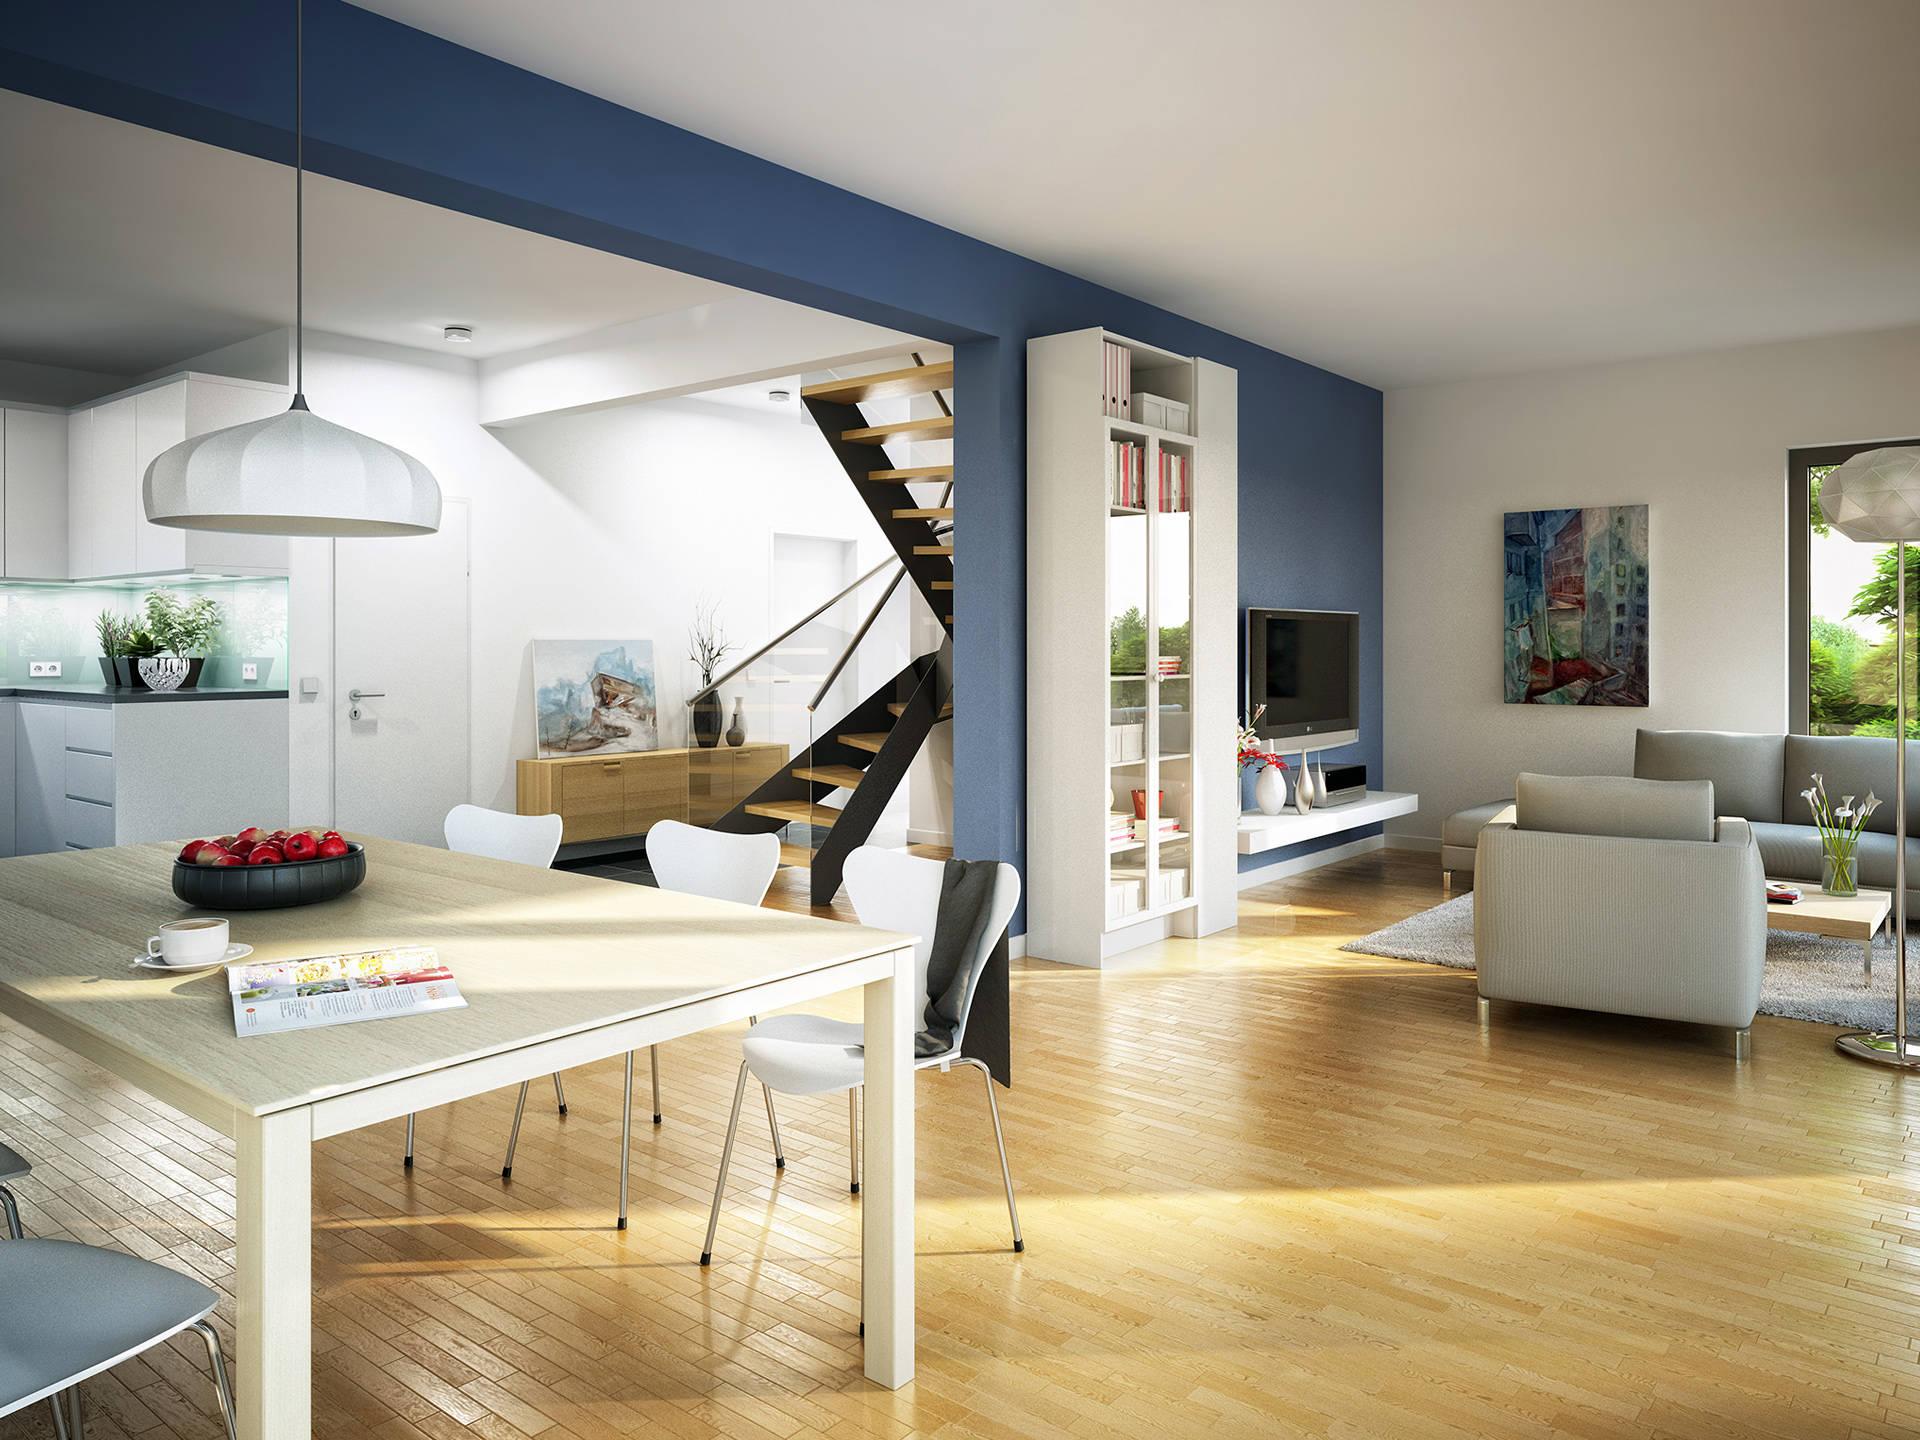 Wohnzimmer Komplett Weis Images. Funvitcom Deckenbeleuchtung ...